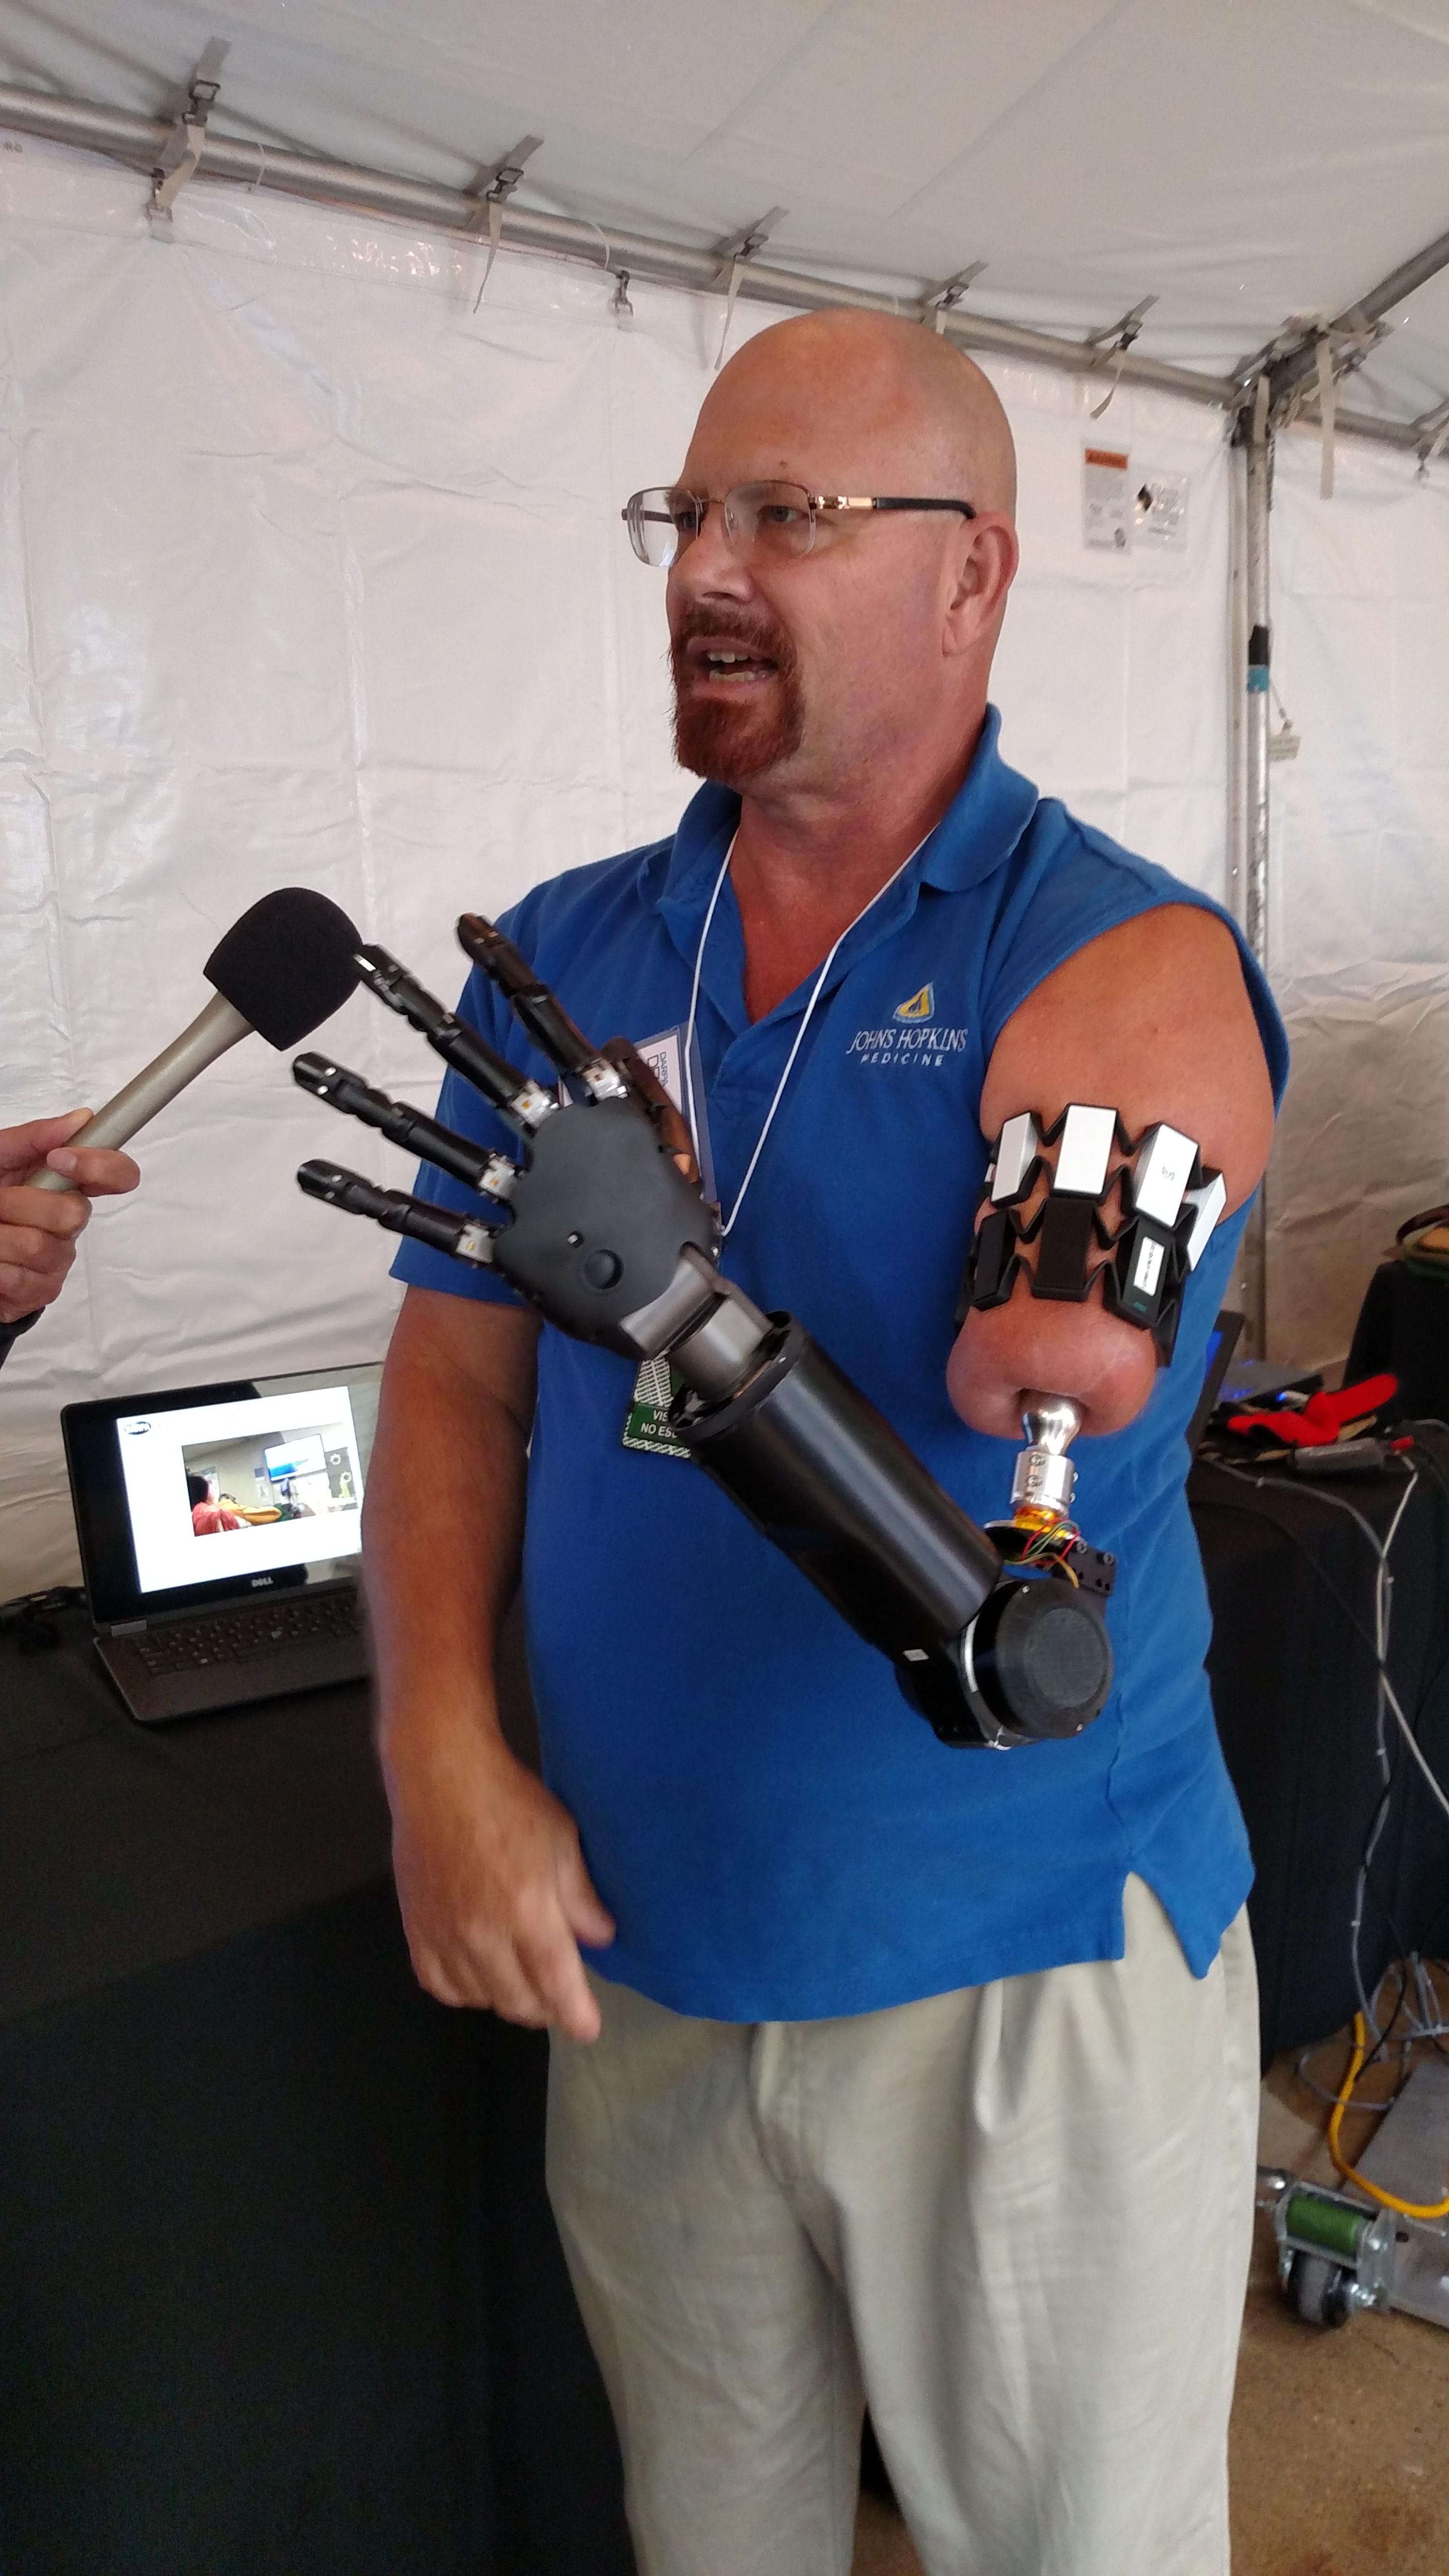 635986621557214036-ARM-DARPA-Day.JPG